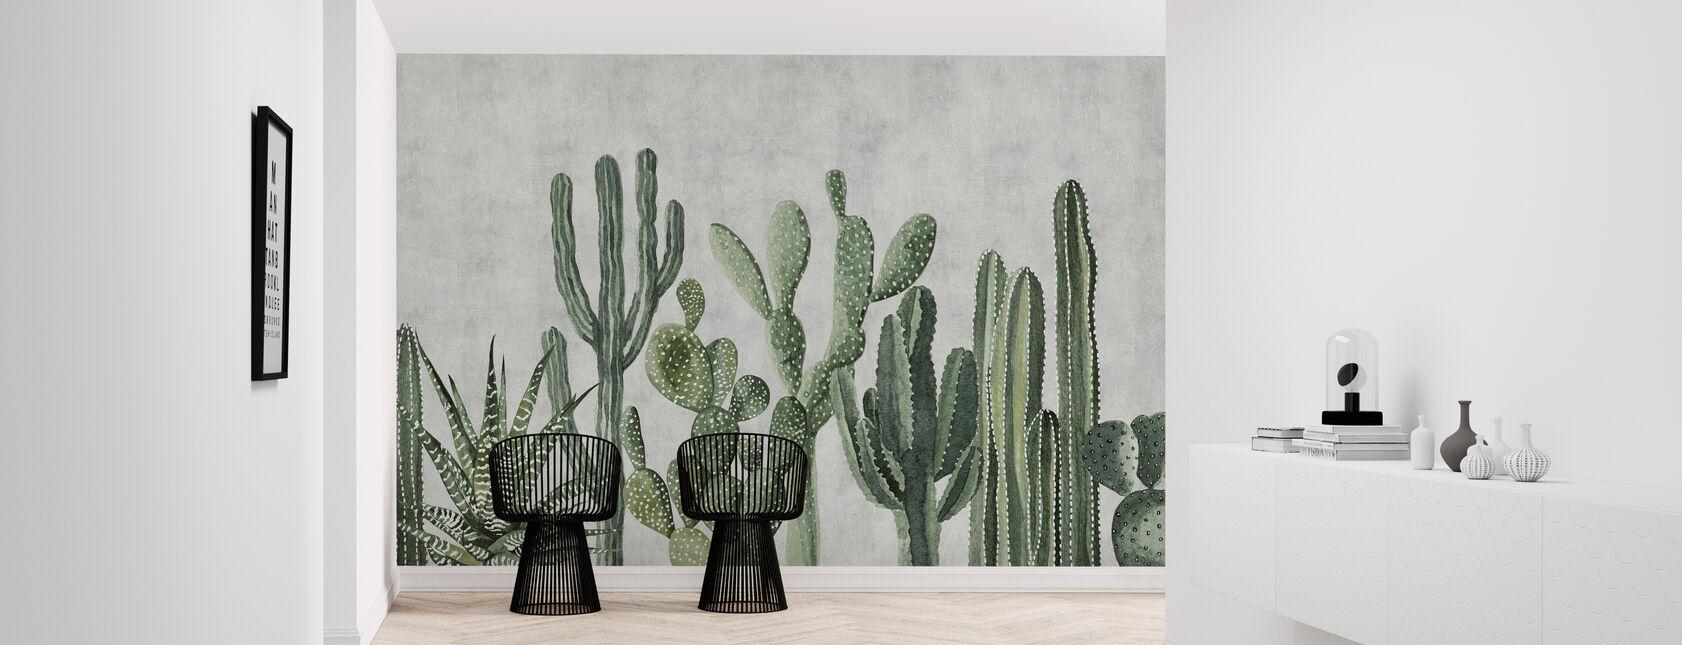 Atacama Kaktus - Tapetti - Aula